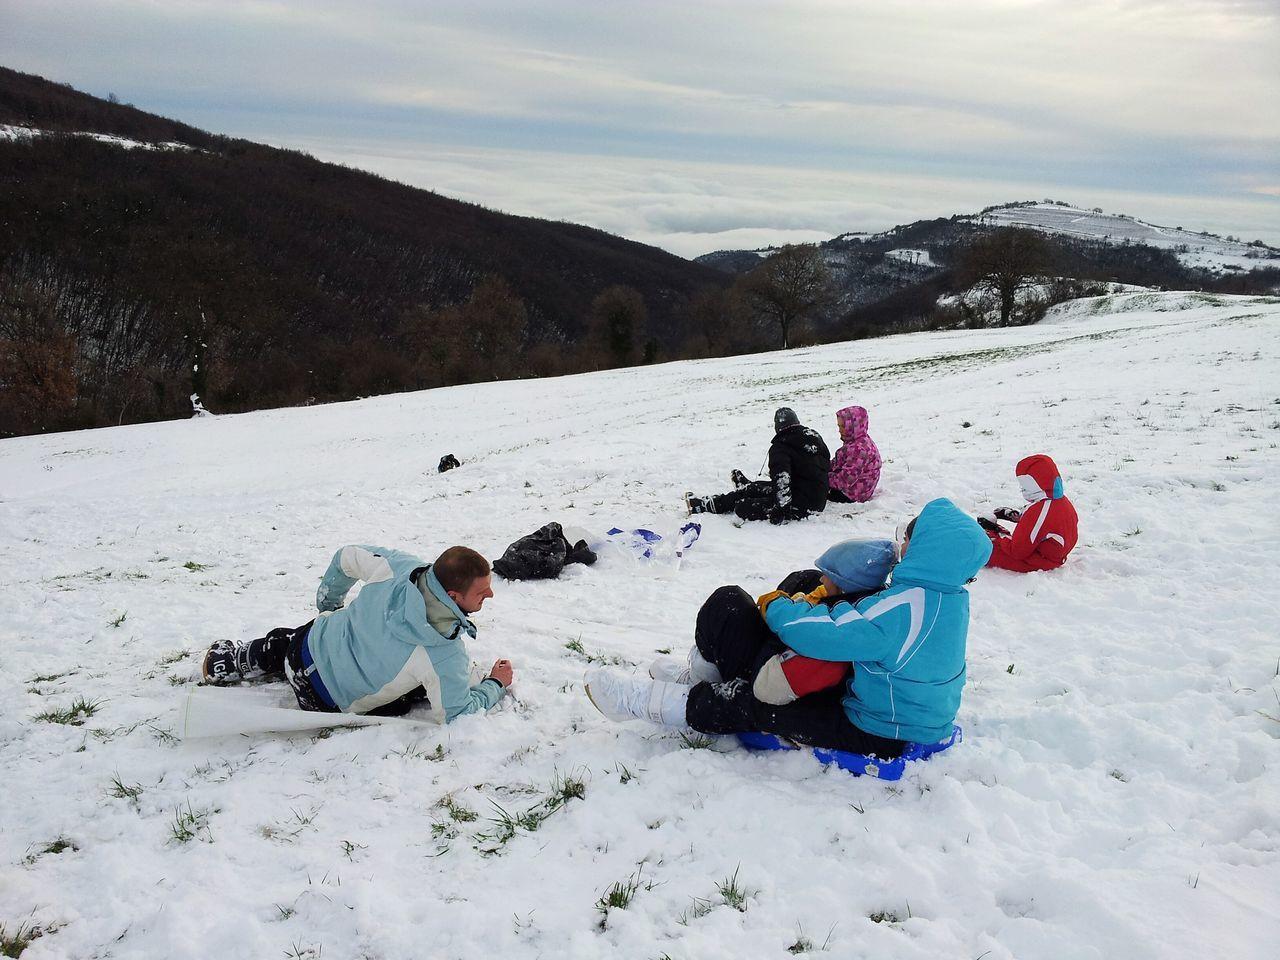 It's Cold Outside Snow Snow ❄ Snow❄⛄ Snow Day Snowwhite Neve Freddo Polare!😆 Freddo Sulla Neve